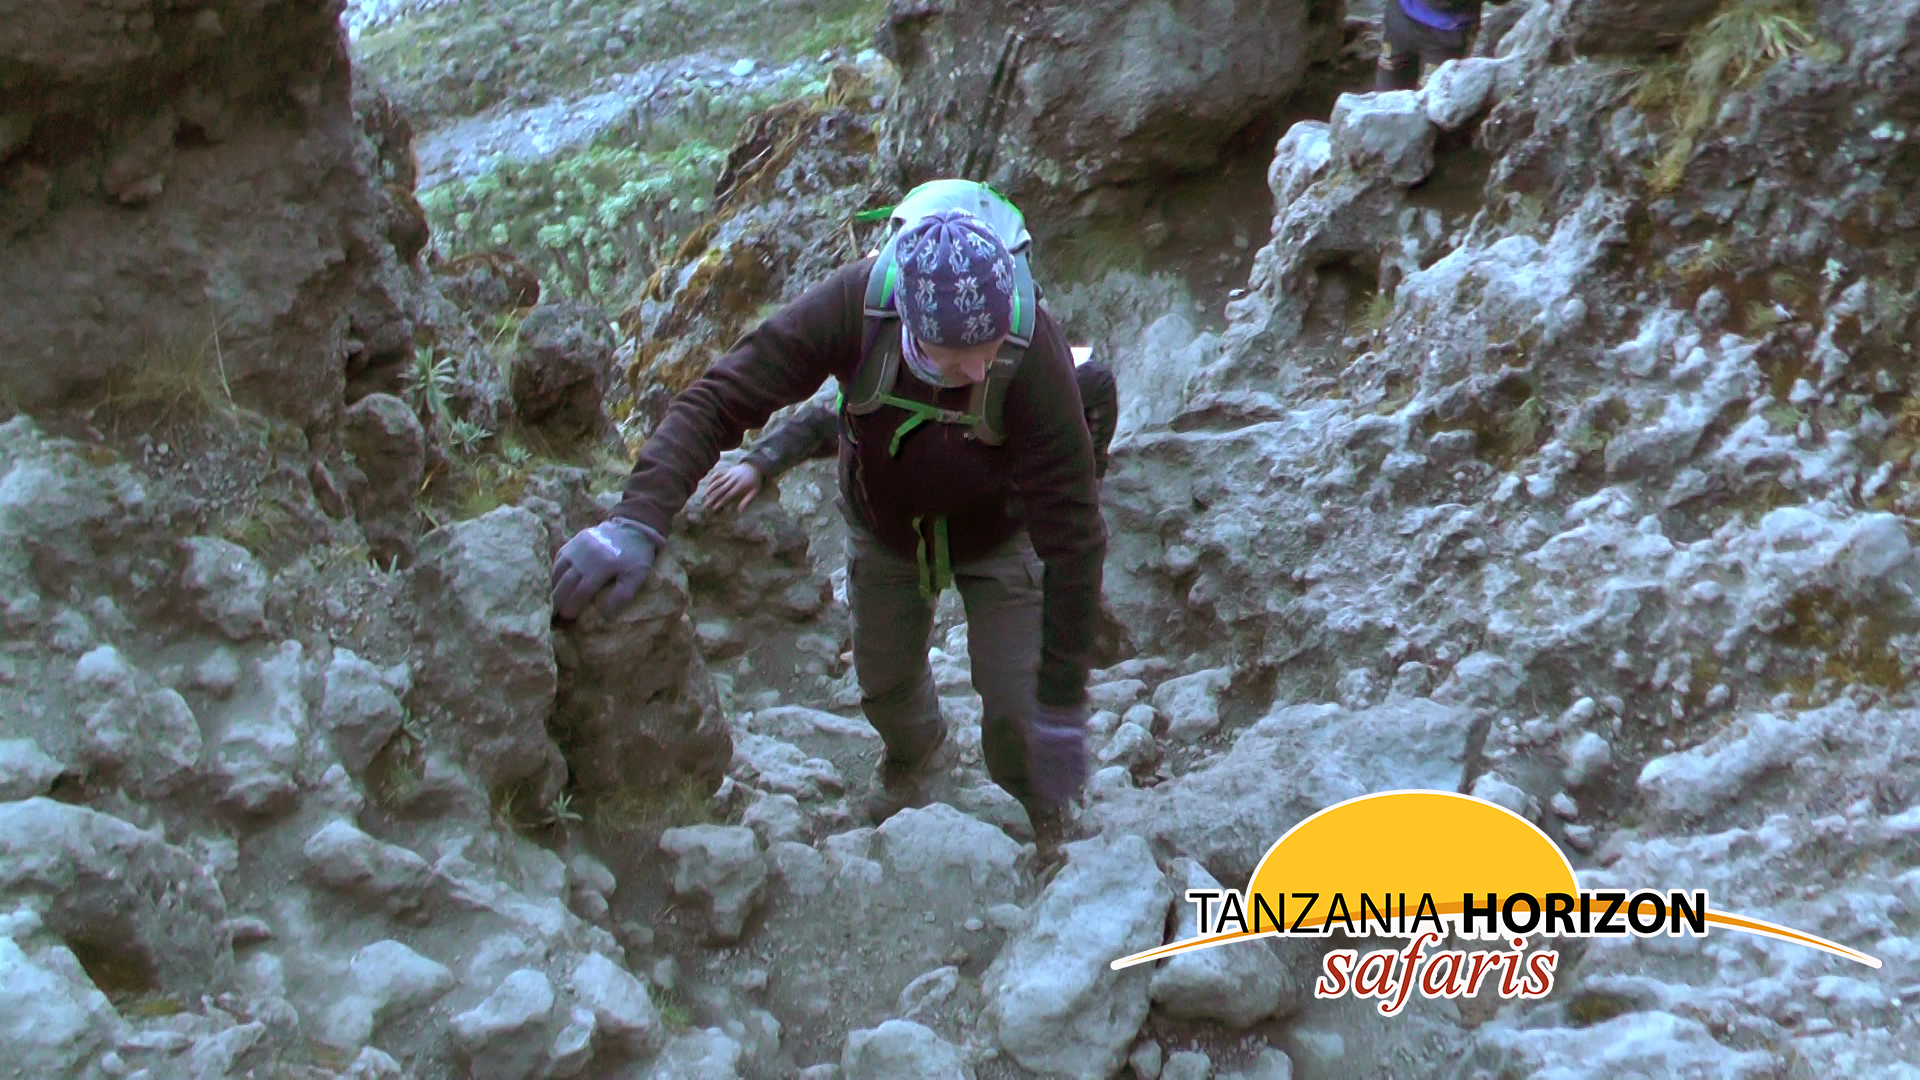 Tanzania Horizon Safaris Climbing Kilimanjaro (22).jpg